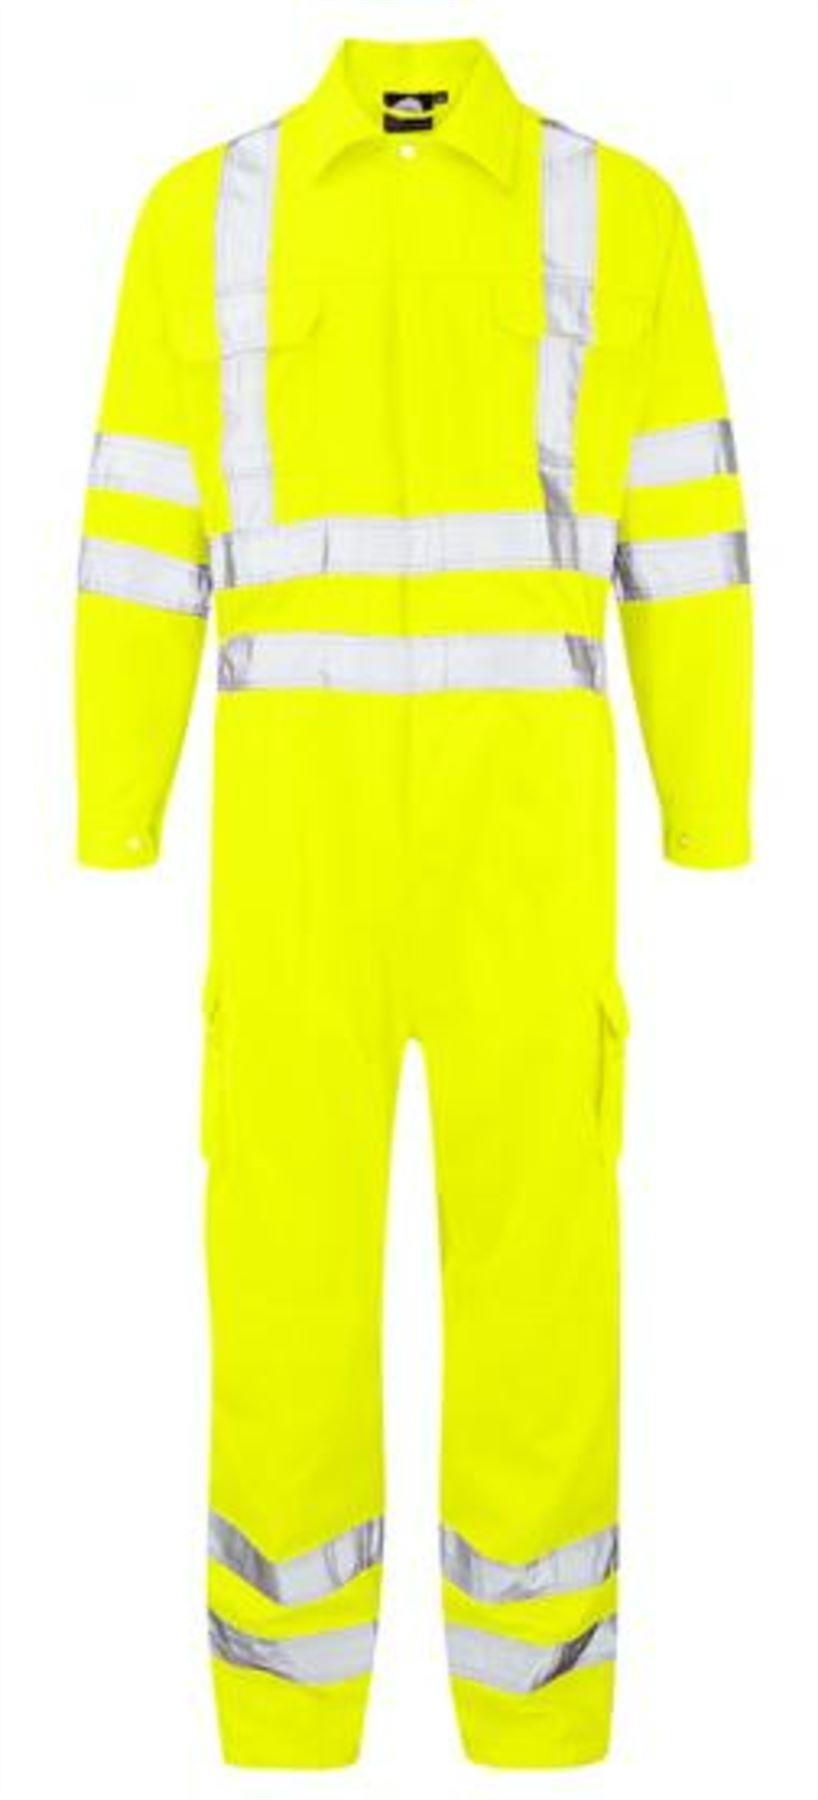 Orn Shrike Hi Vis Overall - Yellow 4XL35L